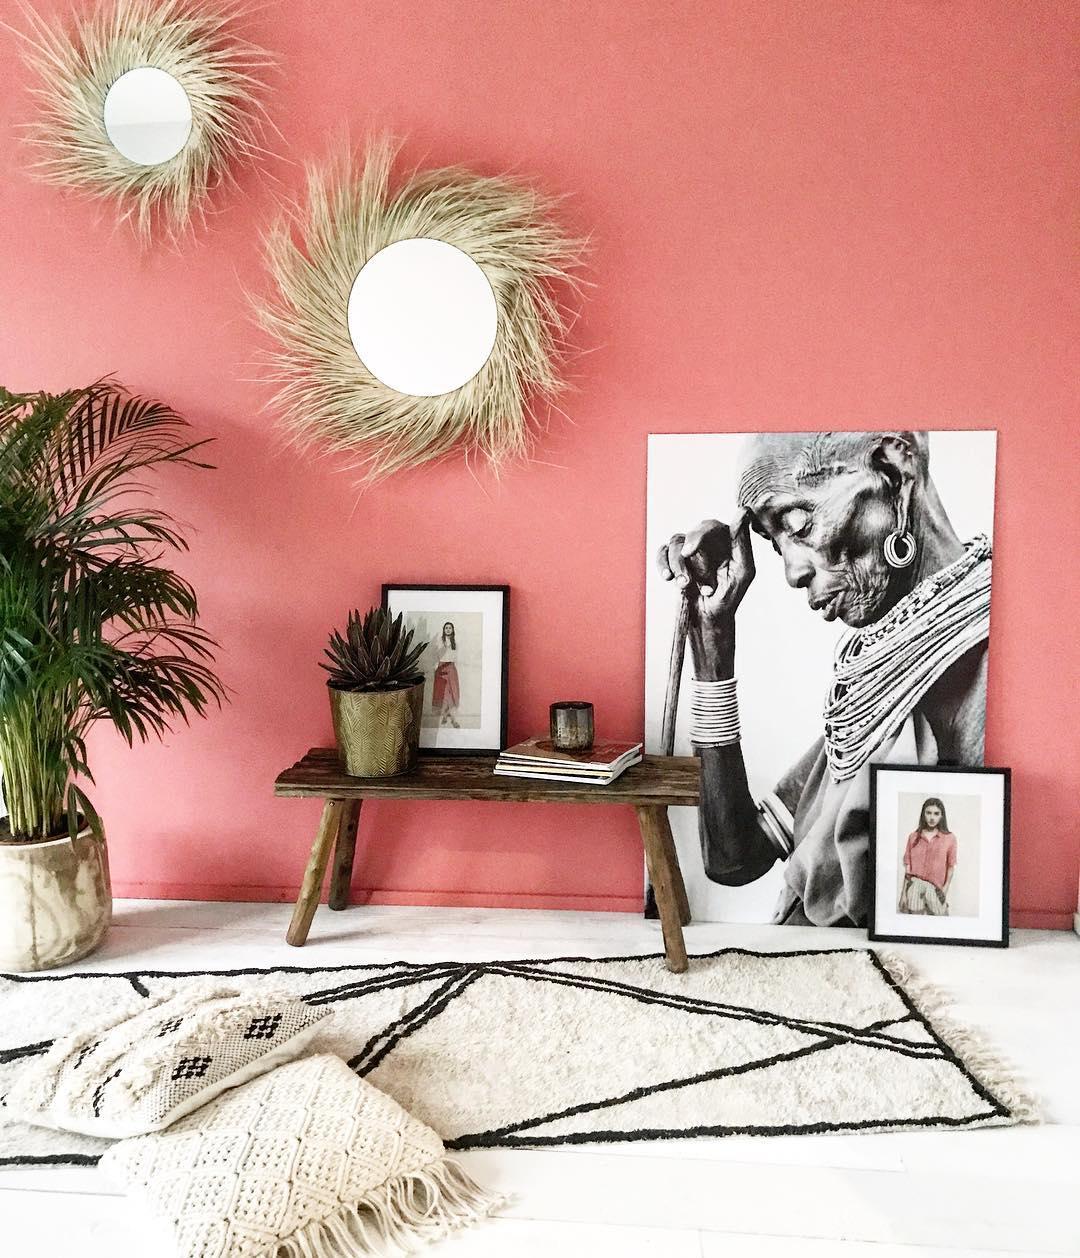 ma chambre d 39 amis d coration ambiance rachelstyliste. Black Bedroom Furniture Sets. Home Design Ideas